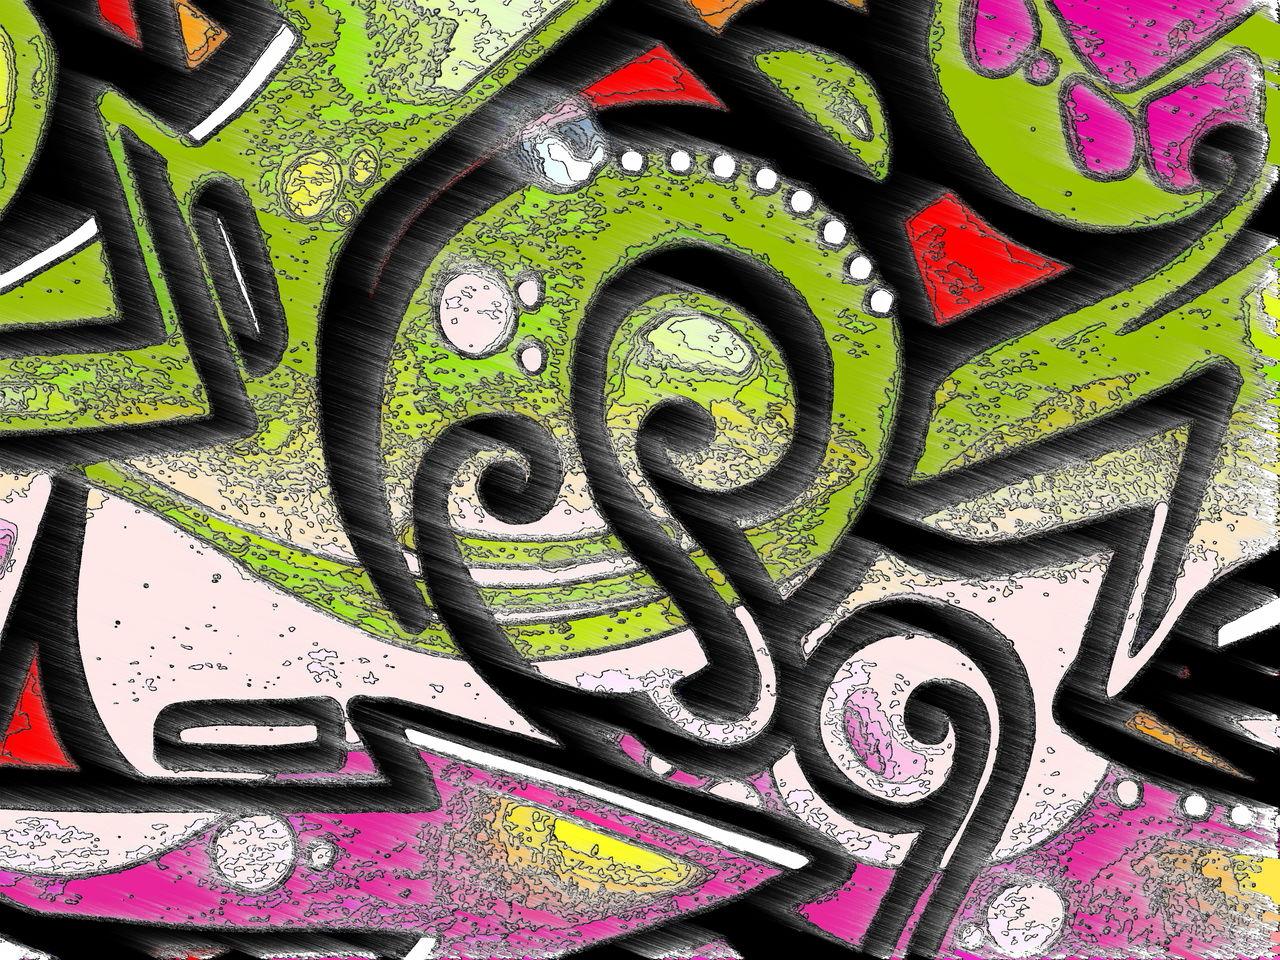 bild abstrakt bschoeni graffiti digitale kunst von bschoeni bei kunstnet. Black Bedroom Furniture Sets. Home Design Ideas